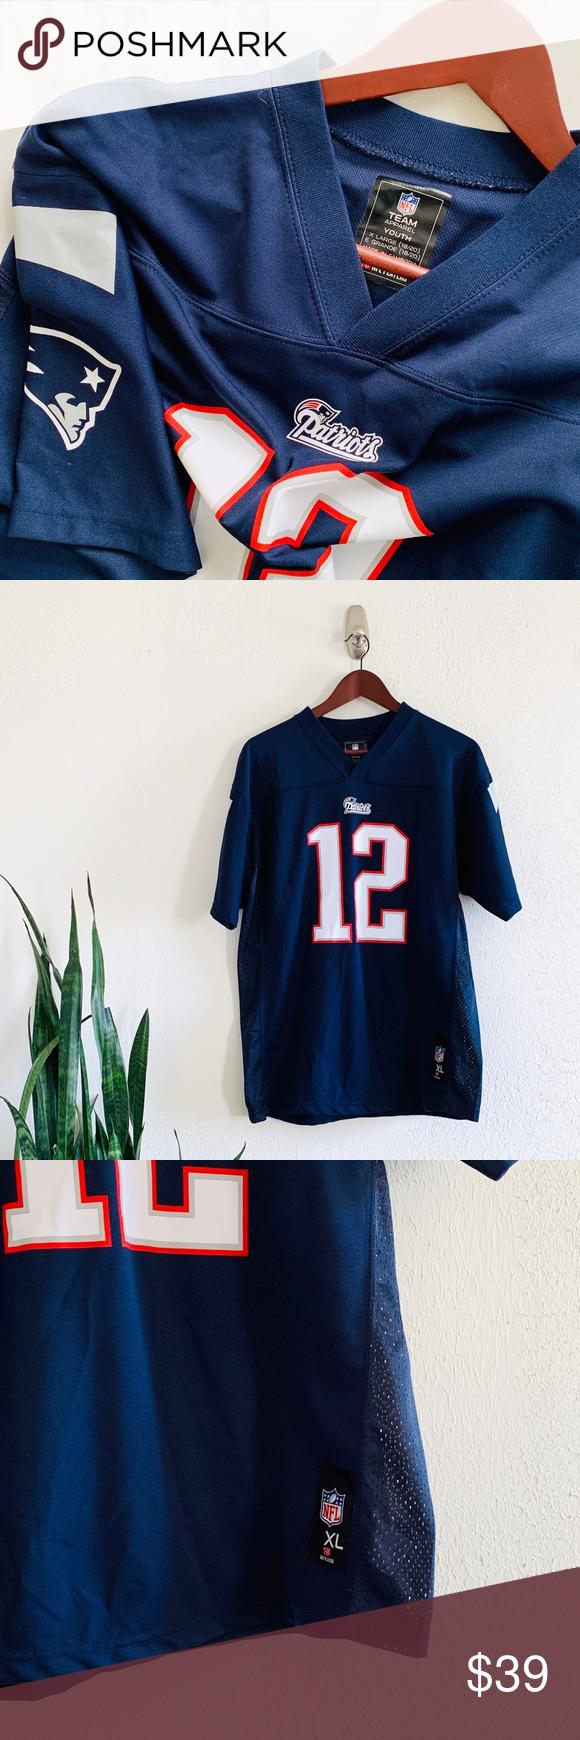 Nfl New England Patriots Blue Tom Brady Jersey Yxl Nfl New England Patriots Tom Brady Jersey New England Patriots